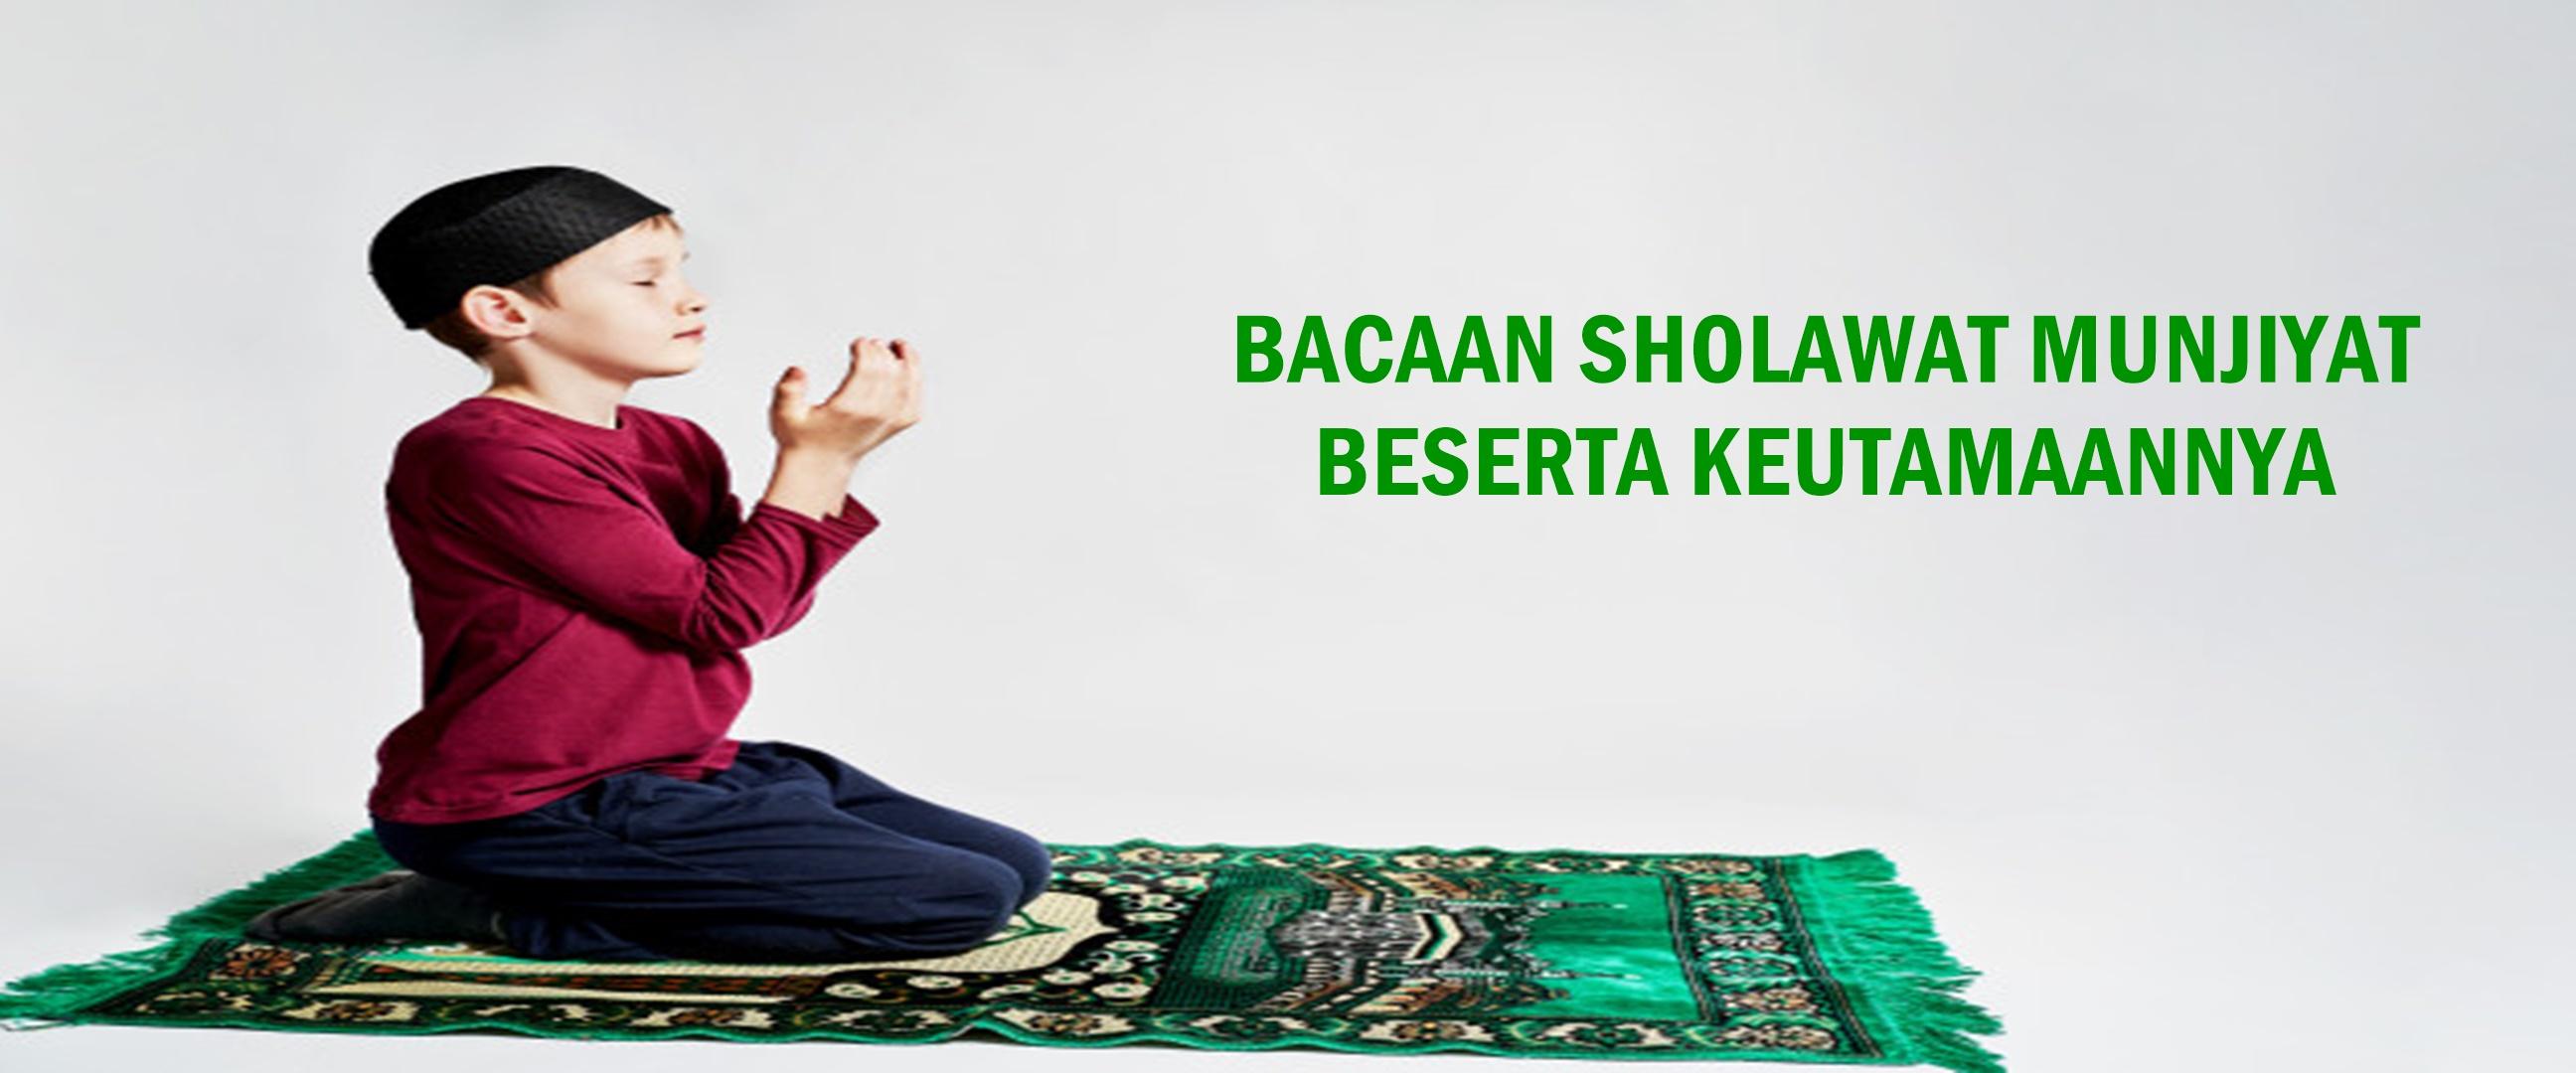 Bacaan sholawat munjiyat beserta keutamaan membacanya bagi umat muslim